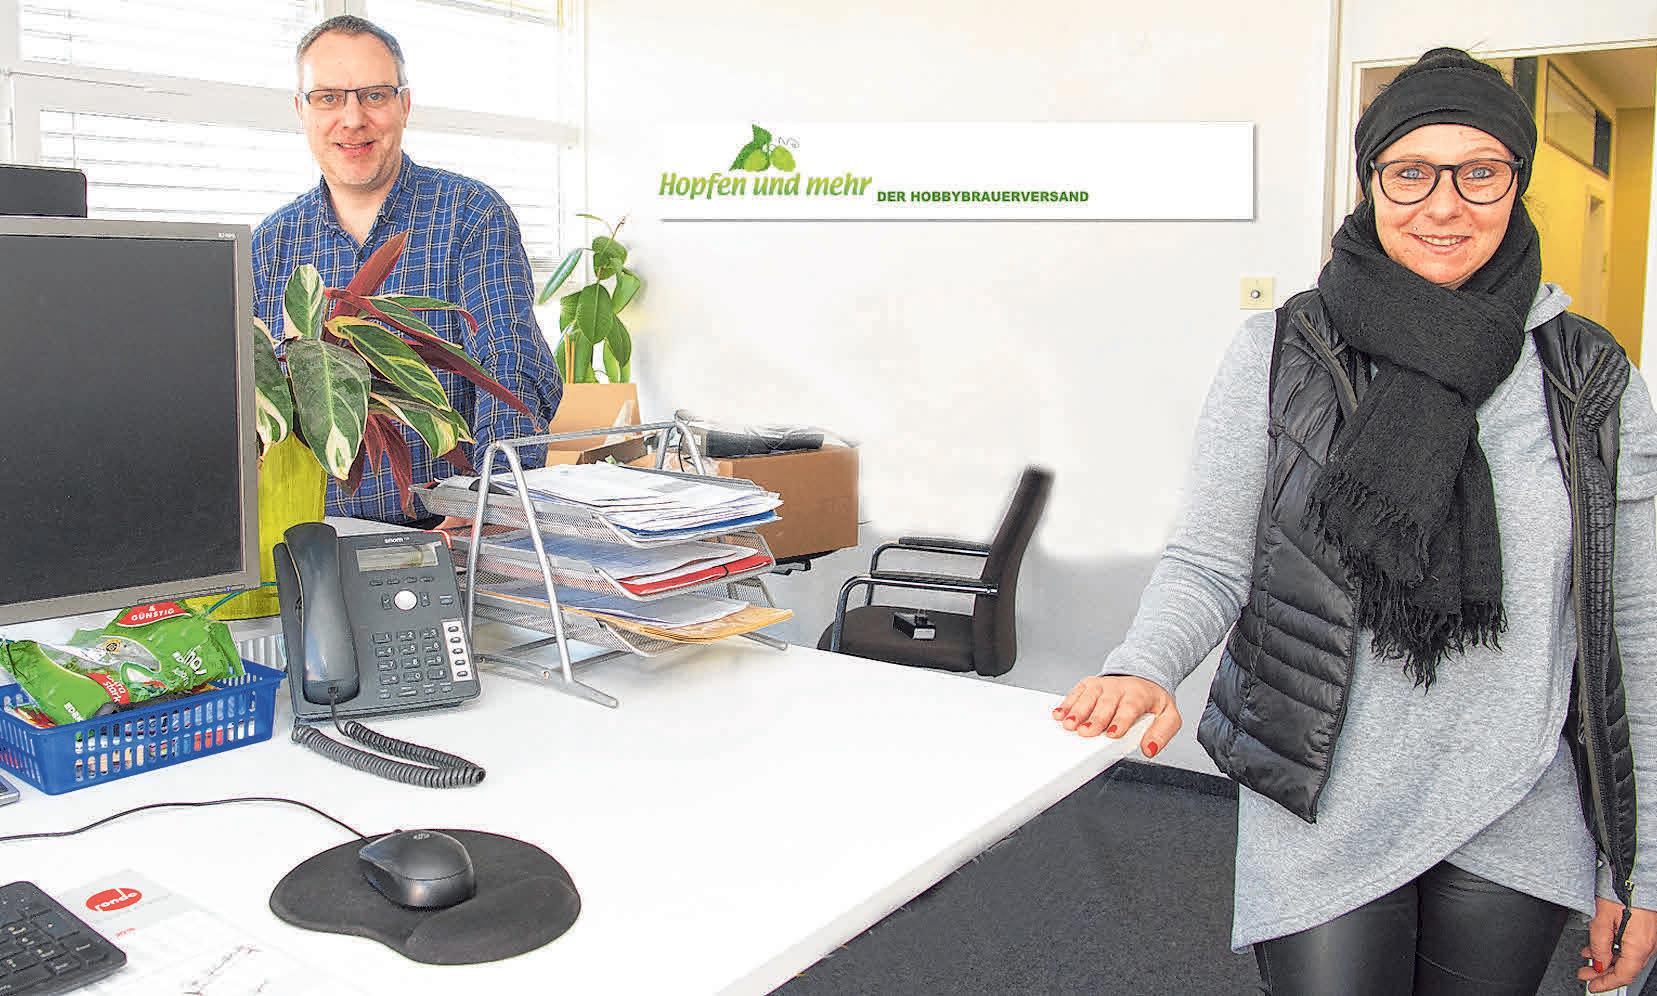 Firmengründer und Geschäftsführer Christian Herkommer und Geschäftsführerin Monika Muranyi freuen sich über den geglückten Umzug.